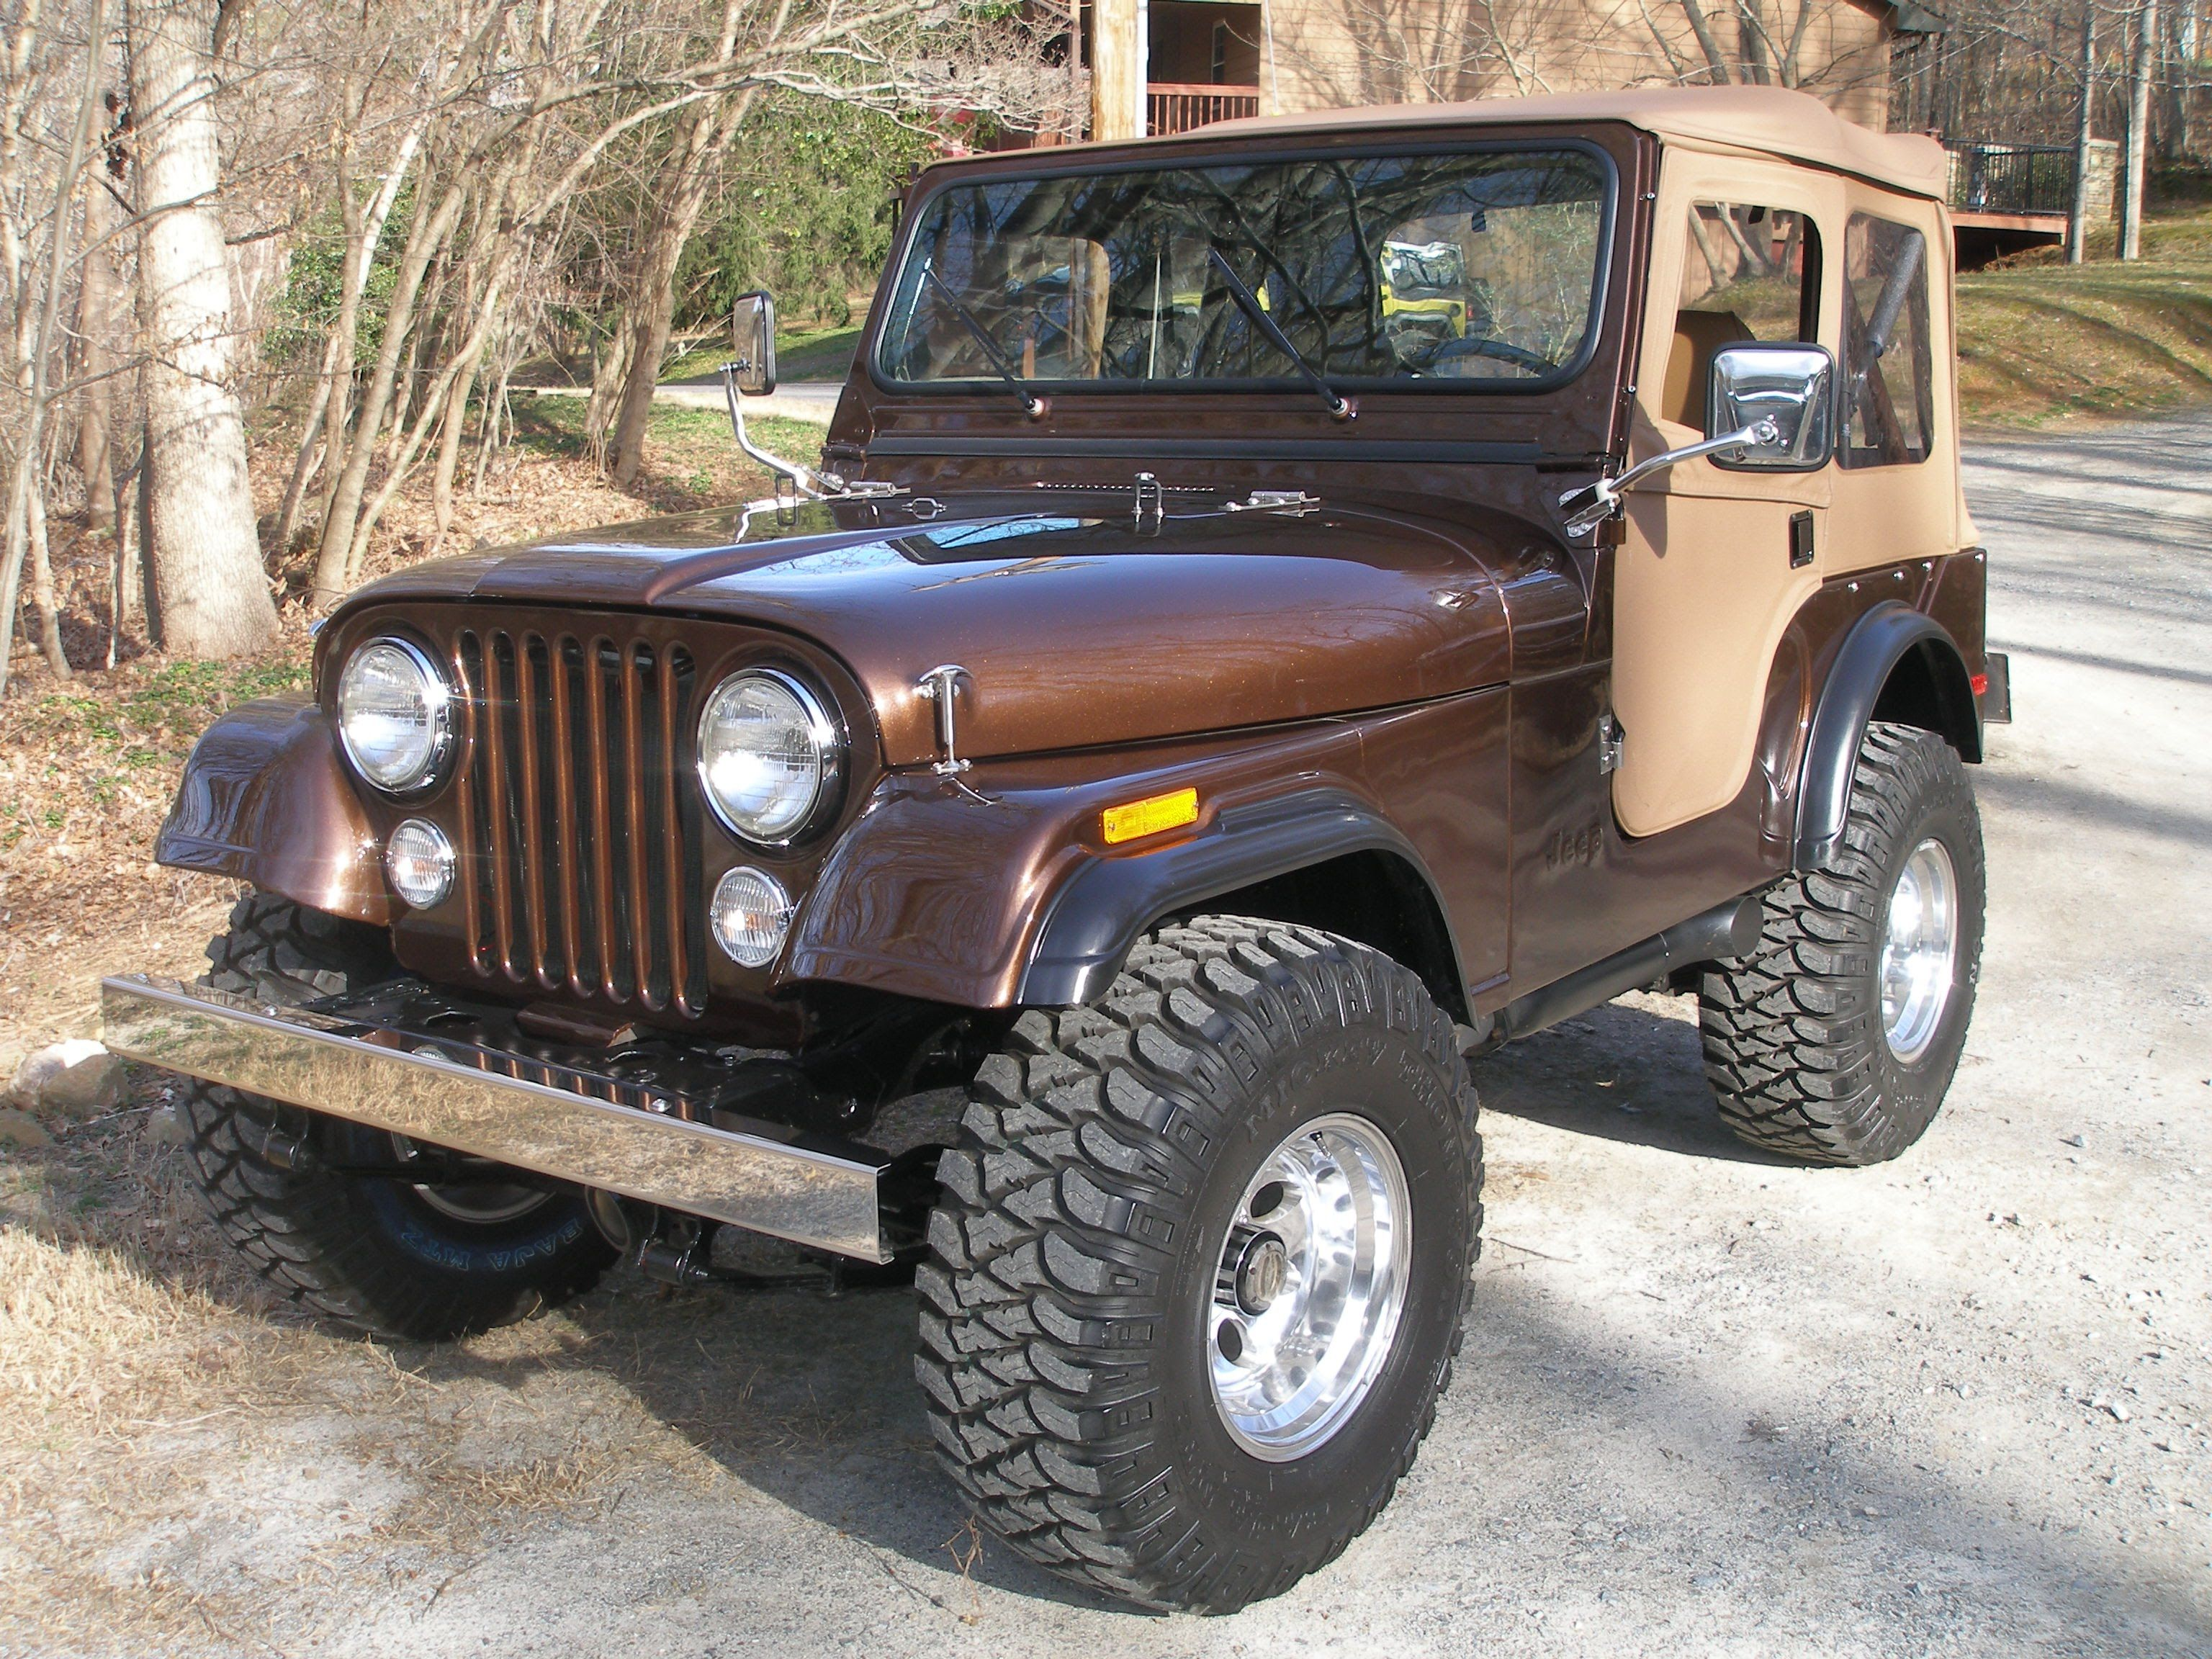 1976 CJ5 sable brown metallic 2 | Jeep | Pinterest | Jeeps, Jeep cj ...